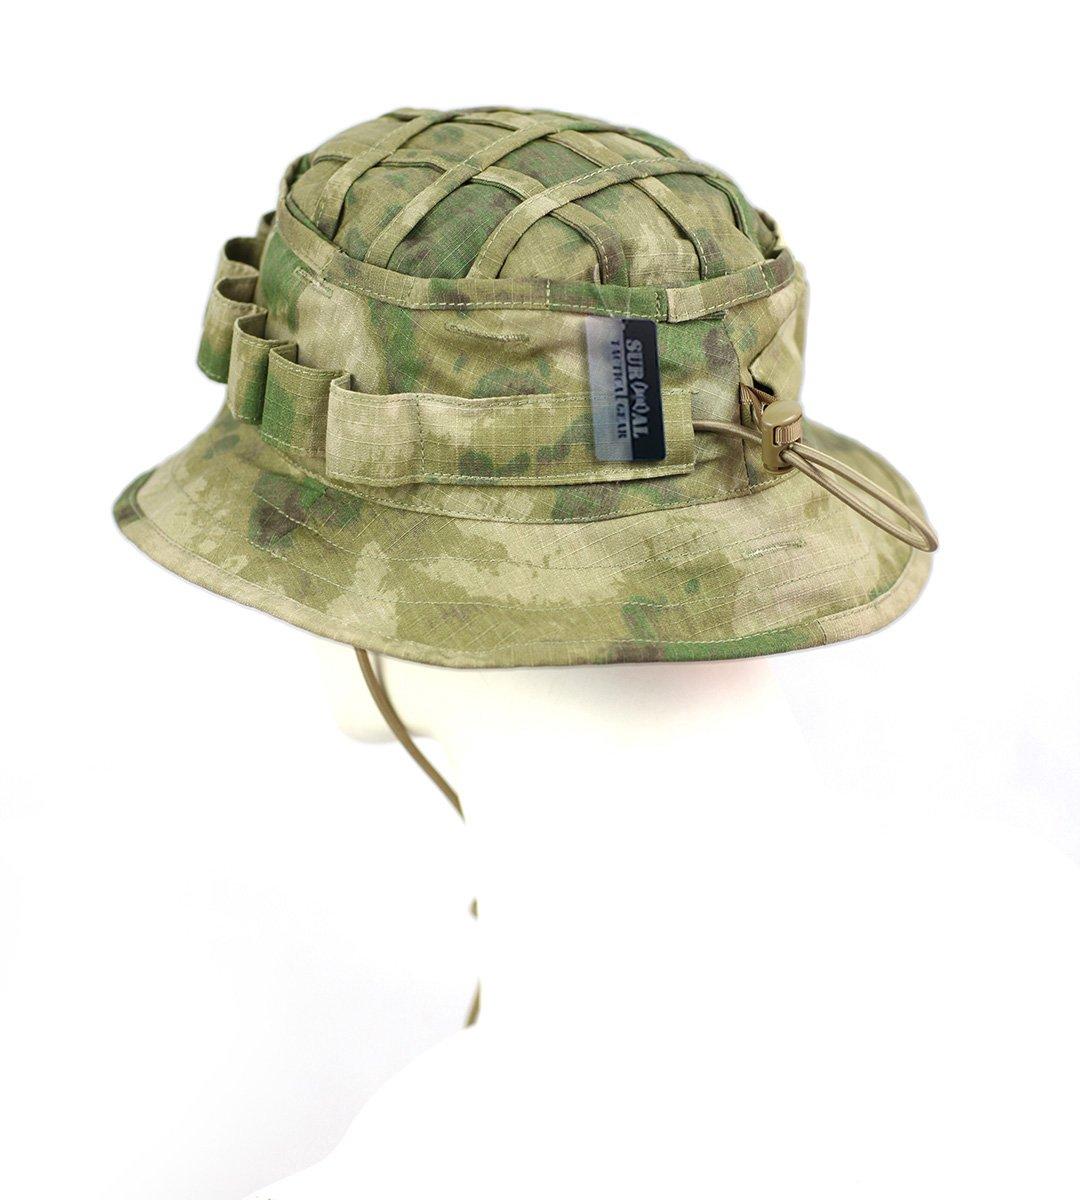 8649856c7cb59 Amazon.com   ZAPT Boonie Hat Military Camo Cap Hunter Sniper Ghillie Bucket  Hats Adjustable Jungle Bush Hat (A-TACS FG Camo)   Sports   Outdoors